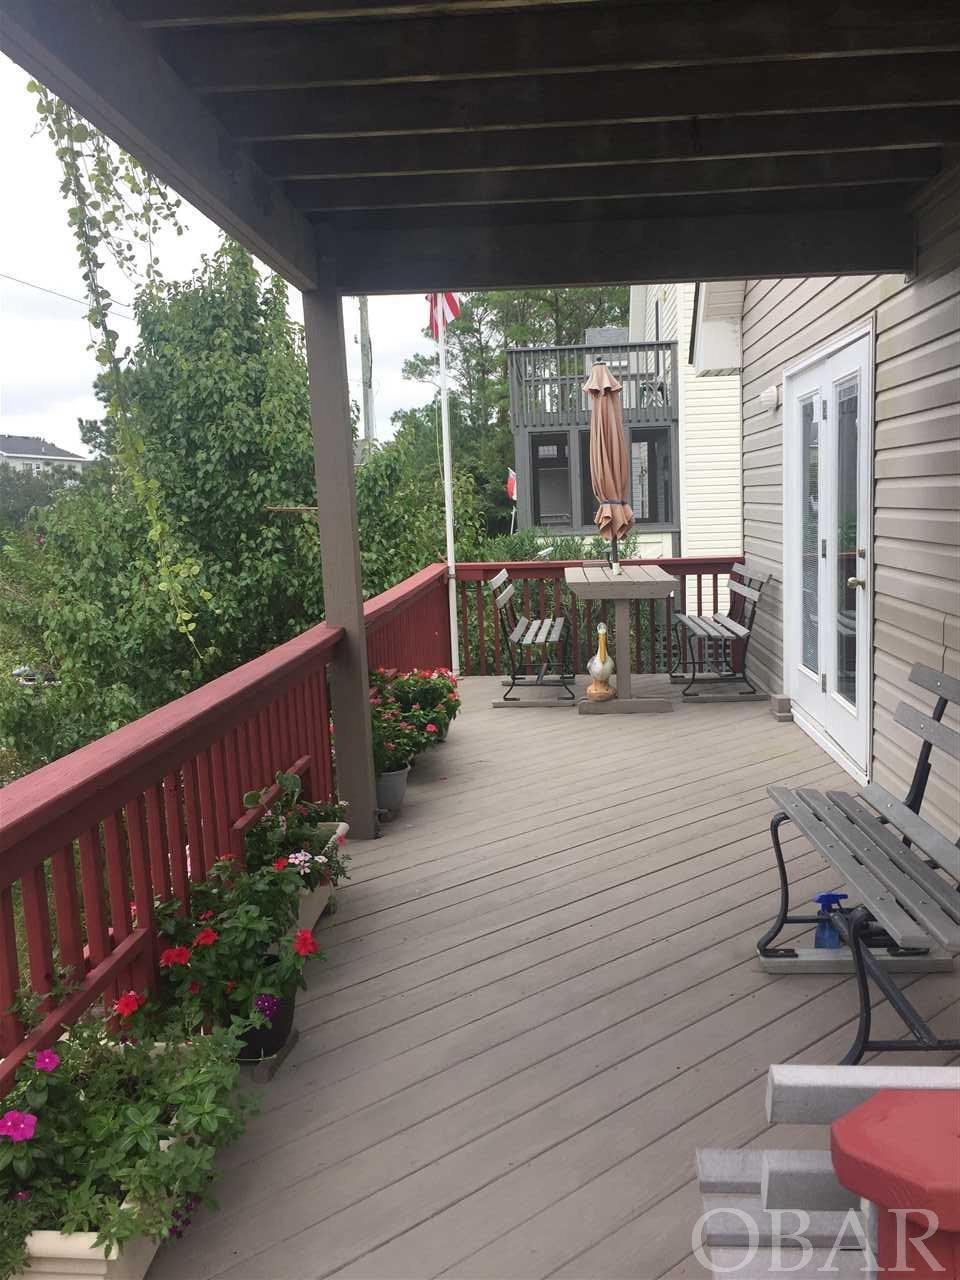 206 Landing Lane,Manteo,NC 27954,3 Bedrooms Bedrooms,2 BathroomsBathrooms,Residential,Landing Lane,97707